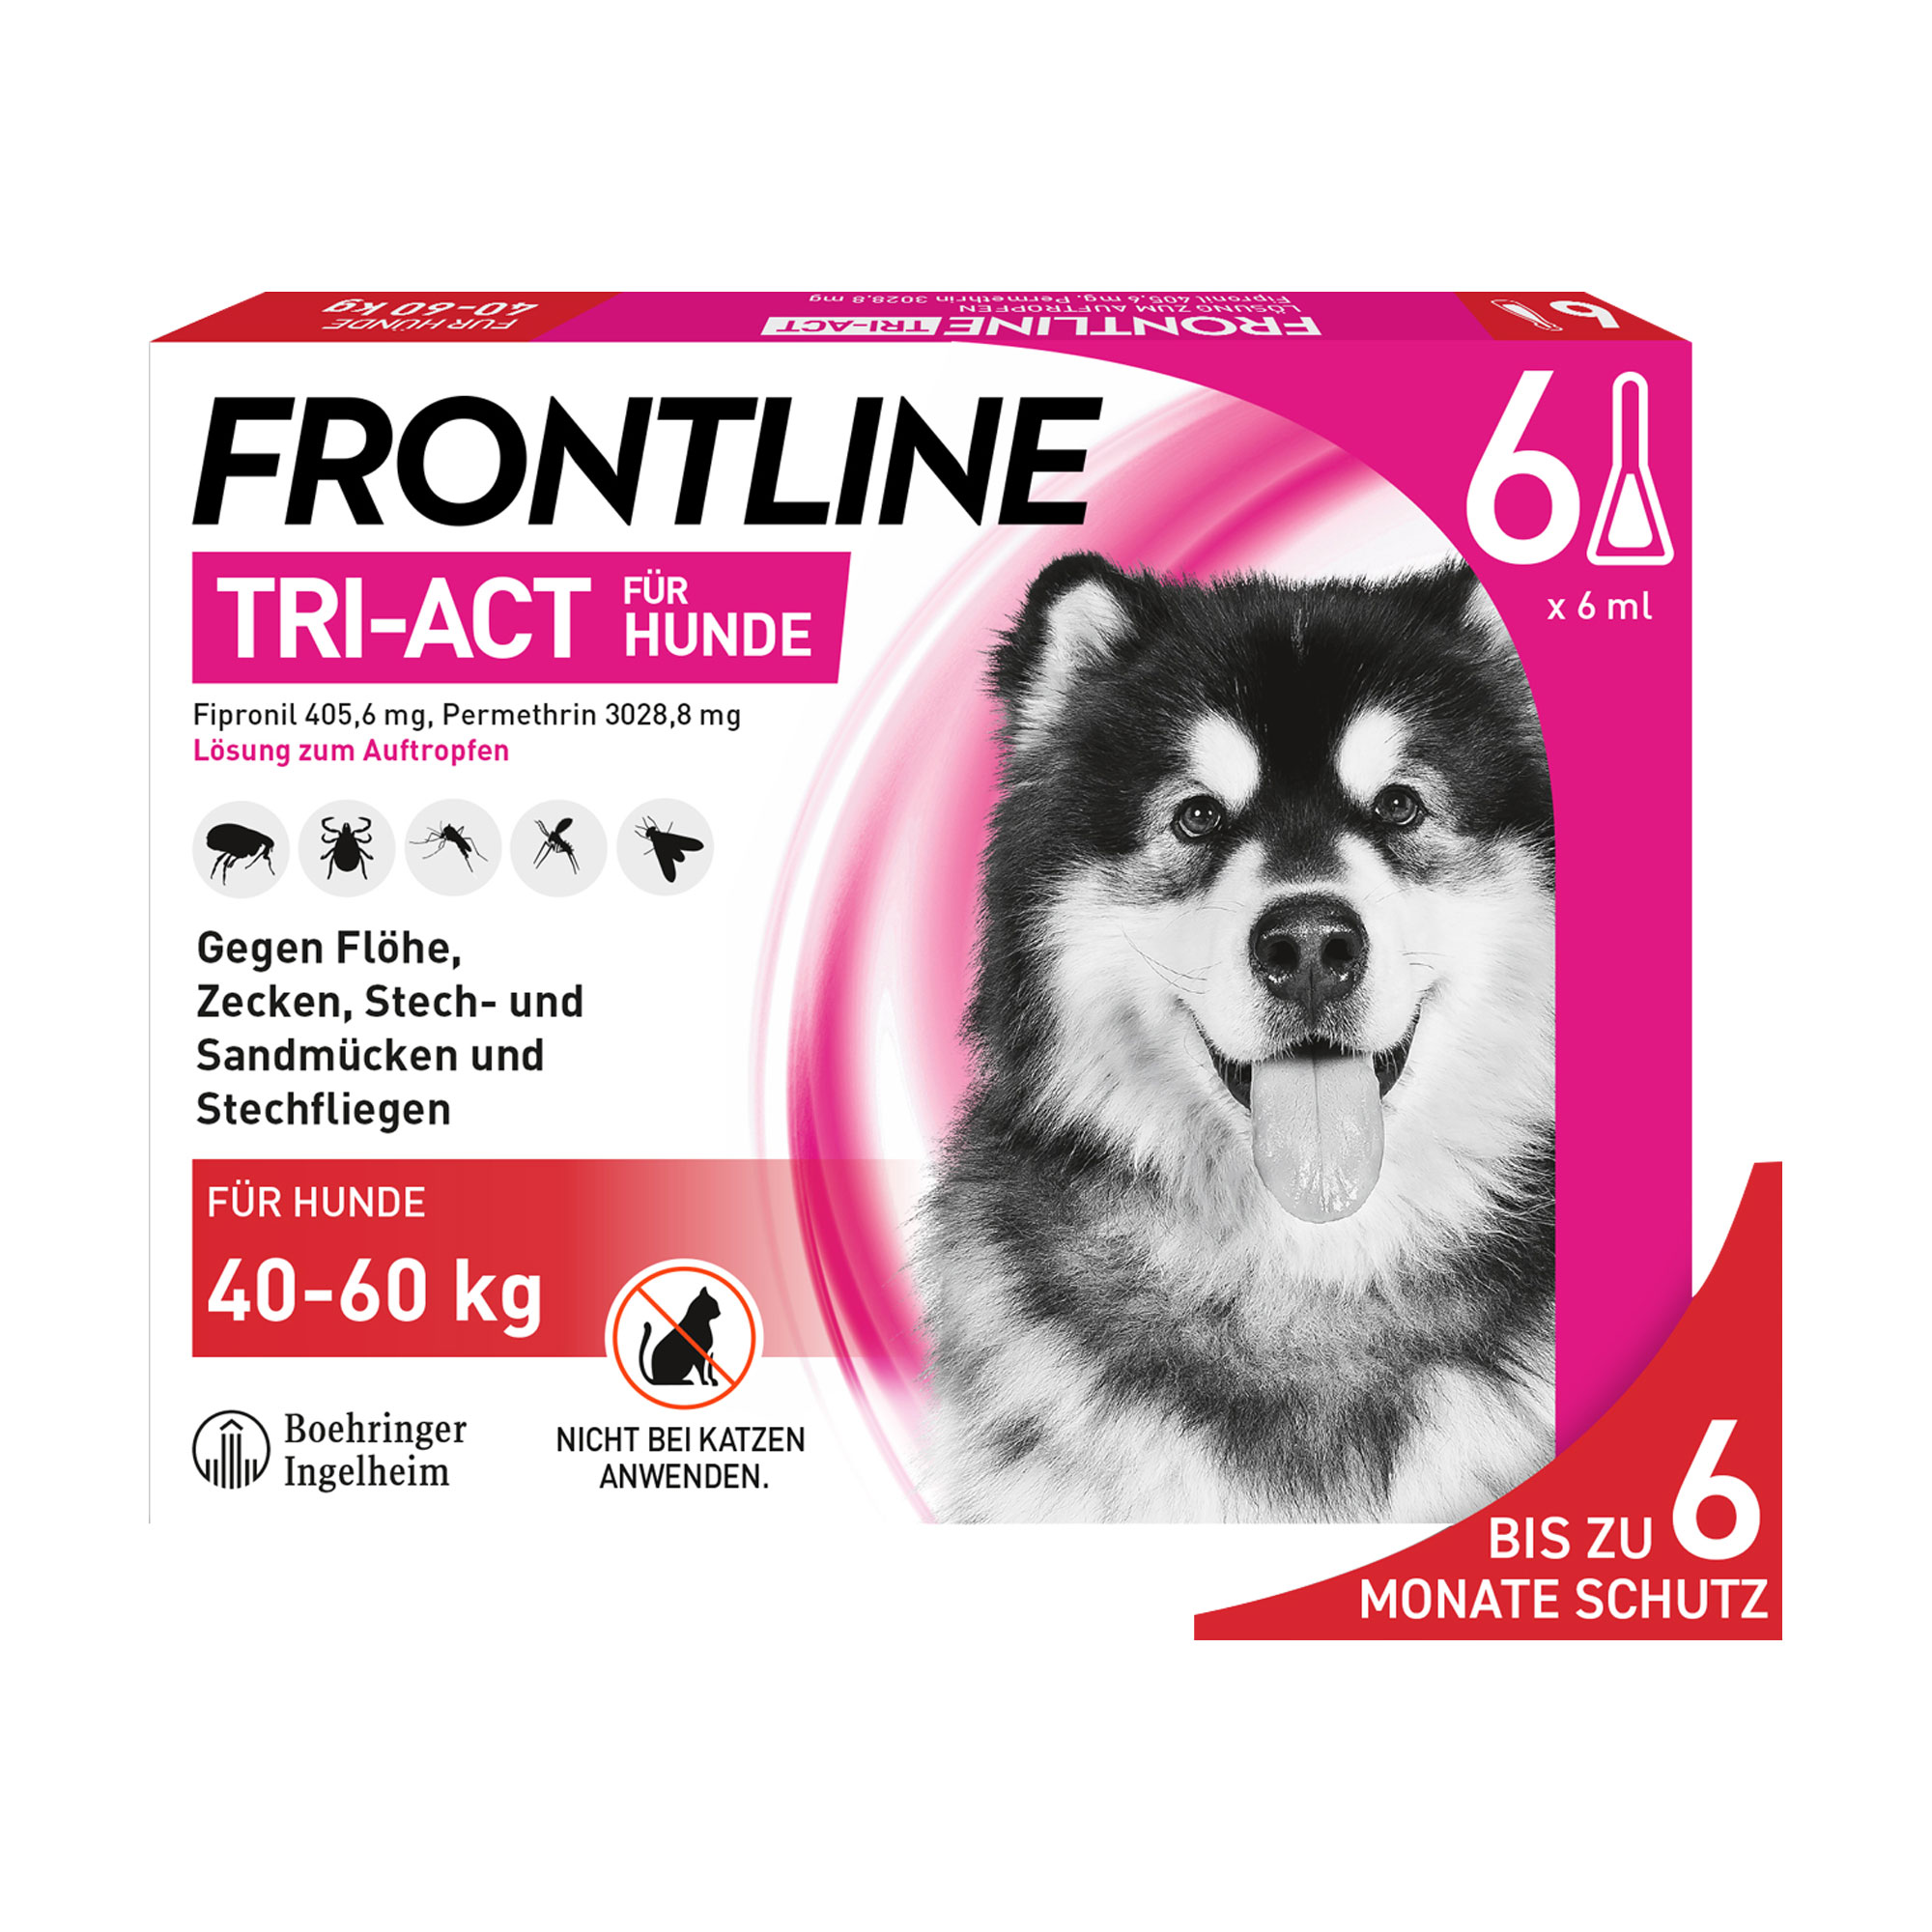 Frontline Tri-Act Hunde 40-60 kg